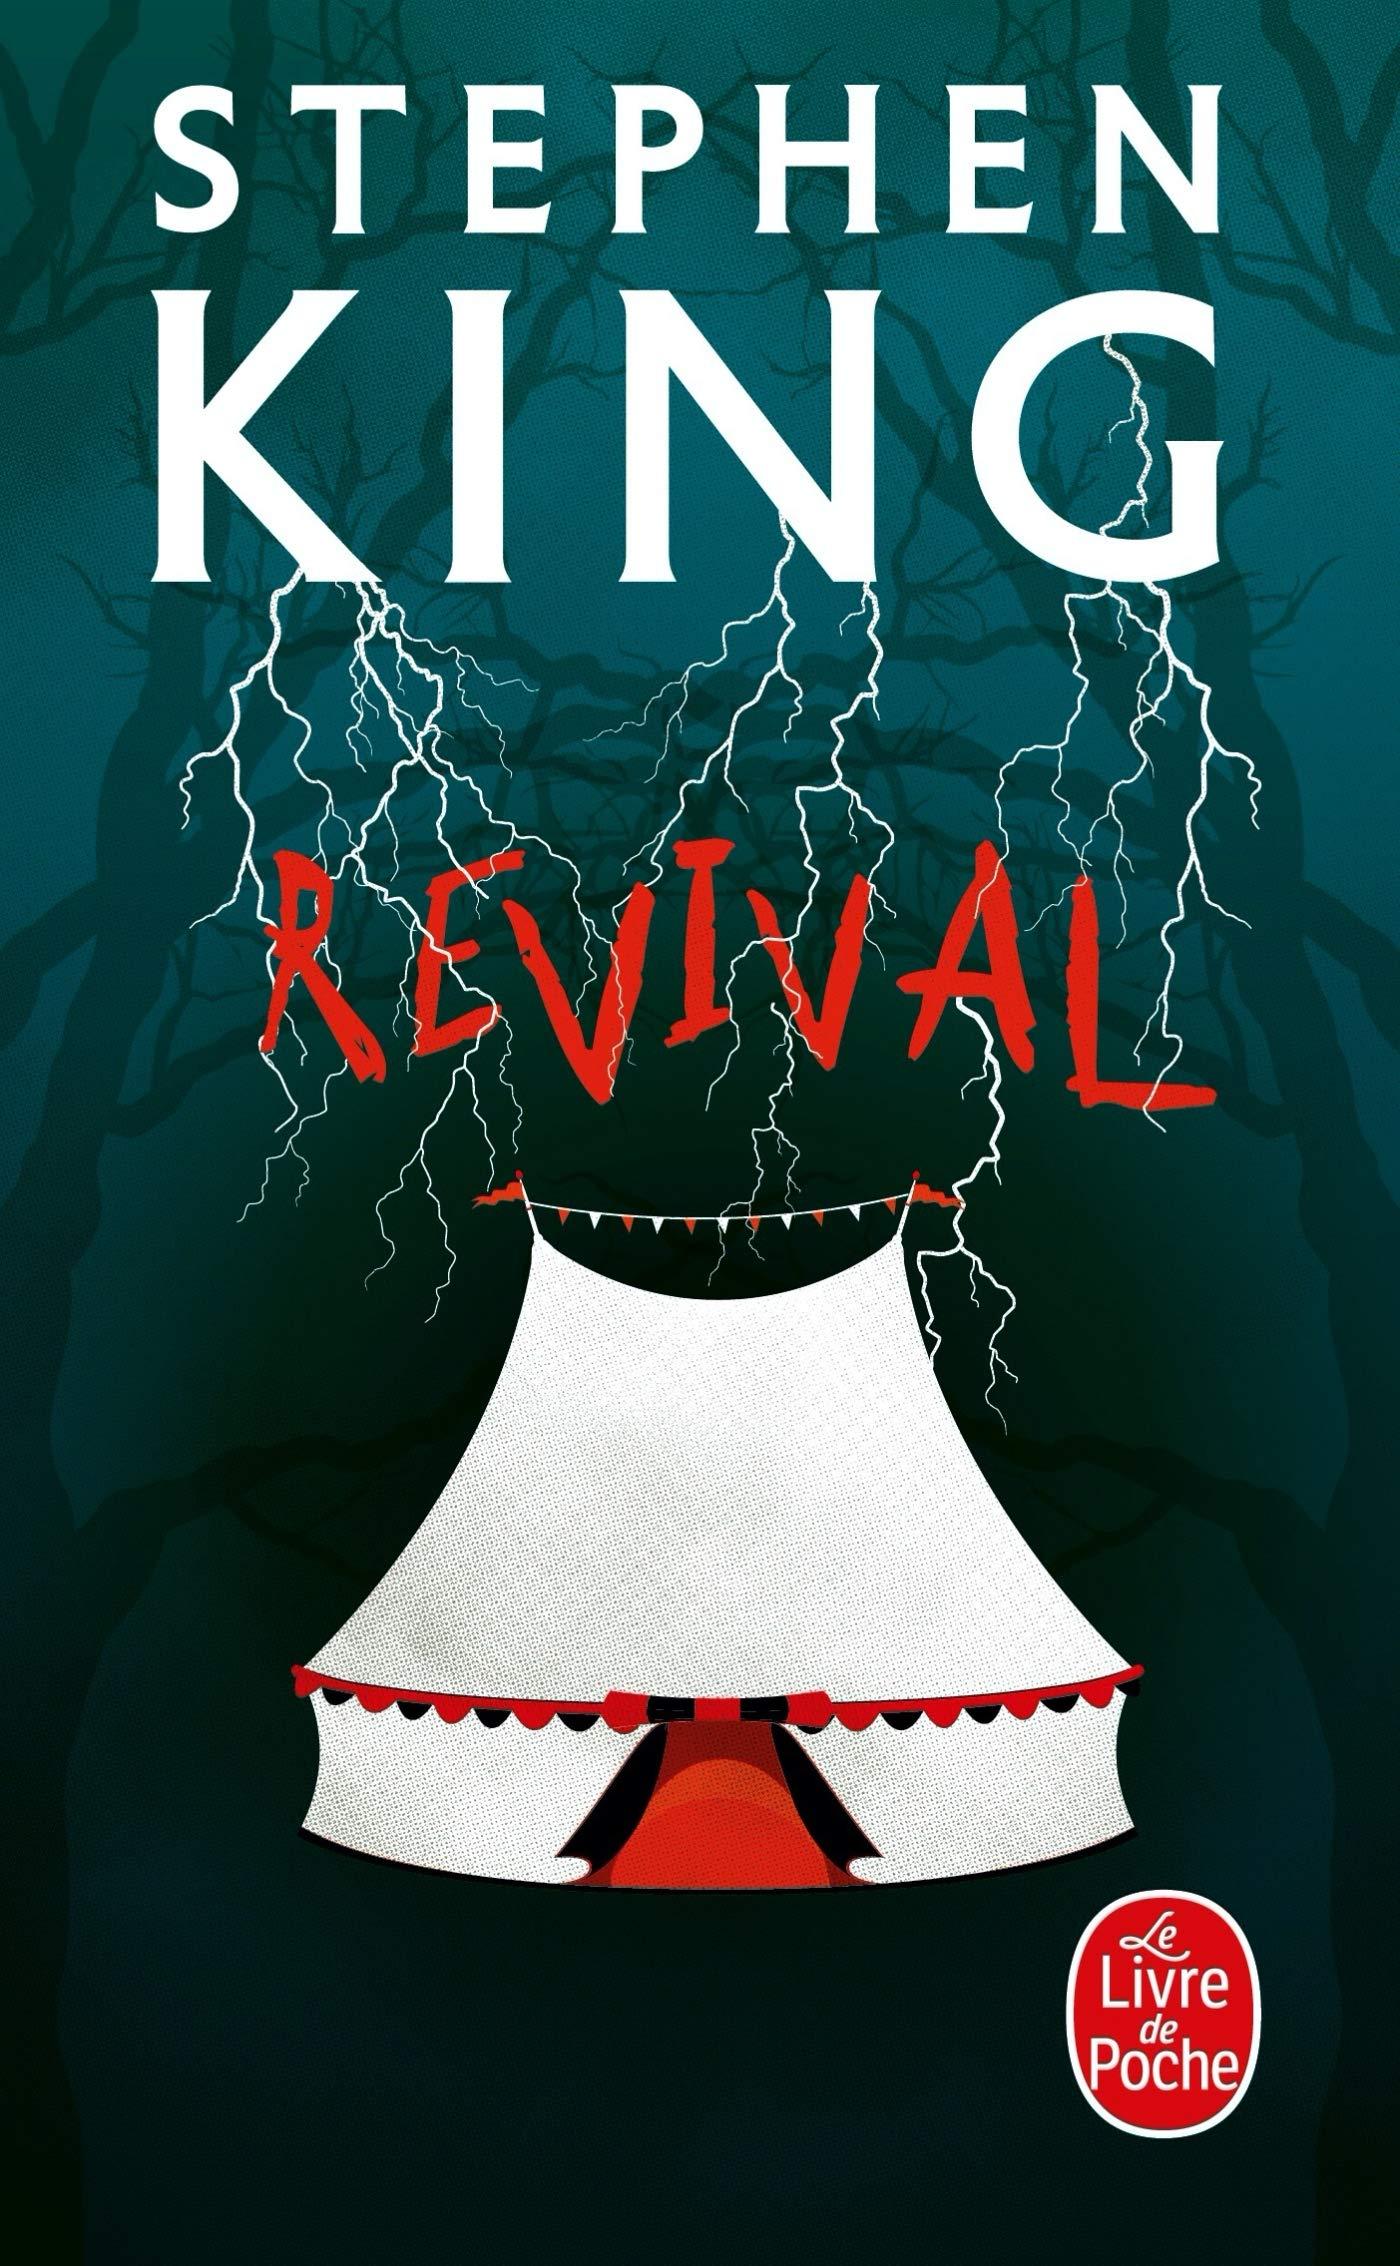 Revival Stephenking Livredepoche2021